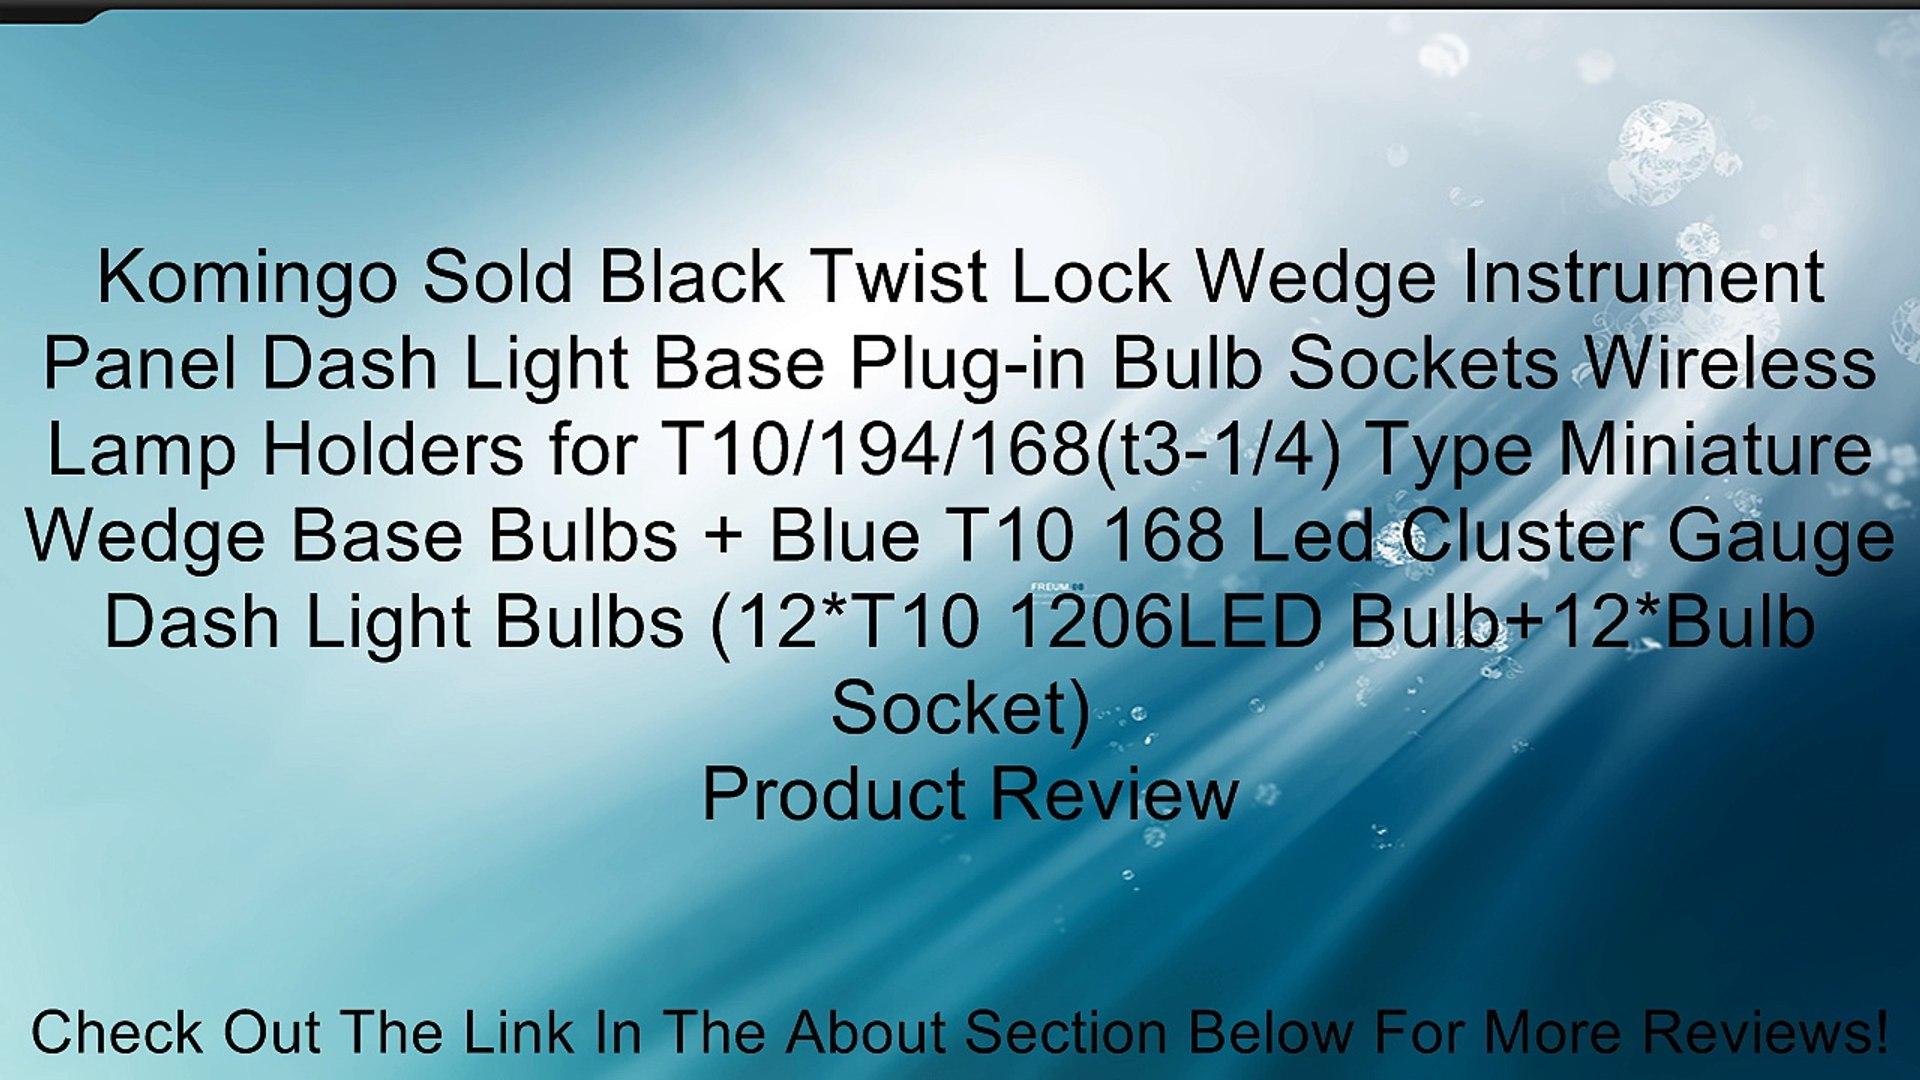 Komingo Sold Black Twist Lock Wedge Instrument Panel Dash Light Base Plug-in Bulb Sockets Wireless L